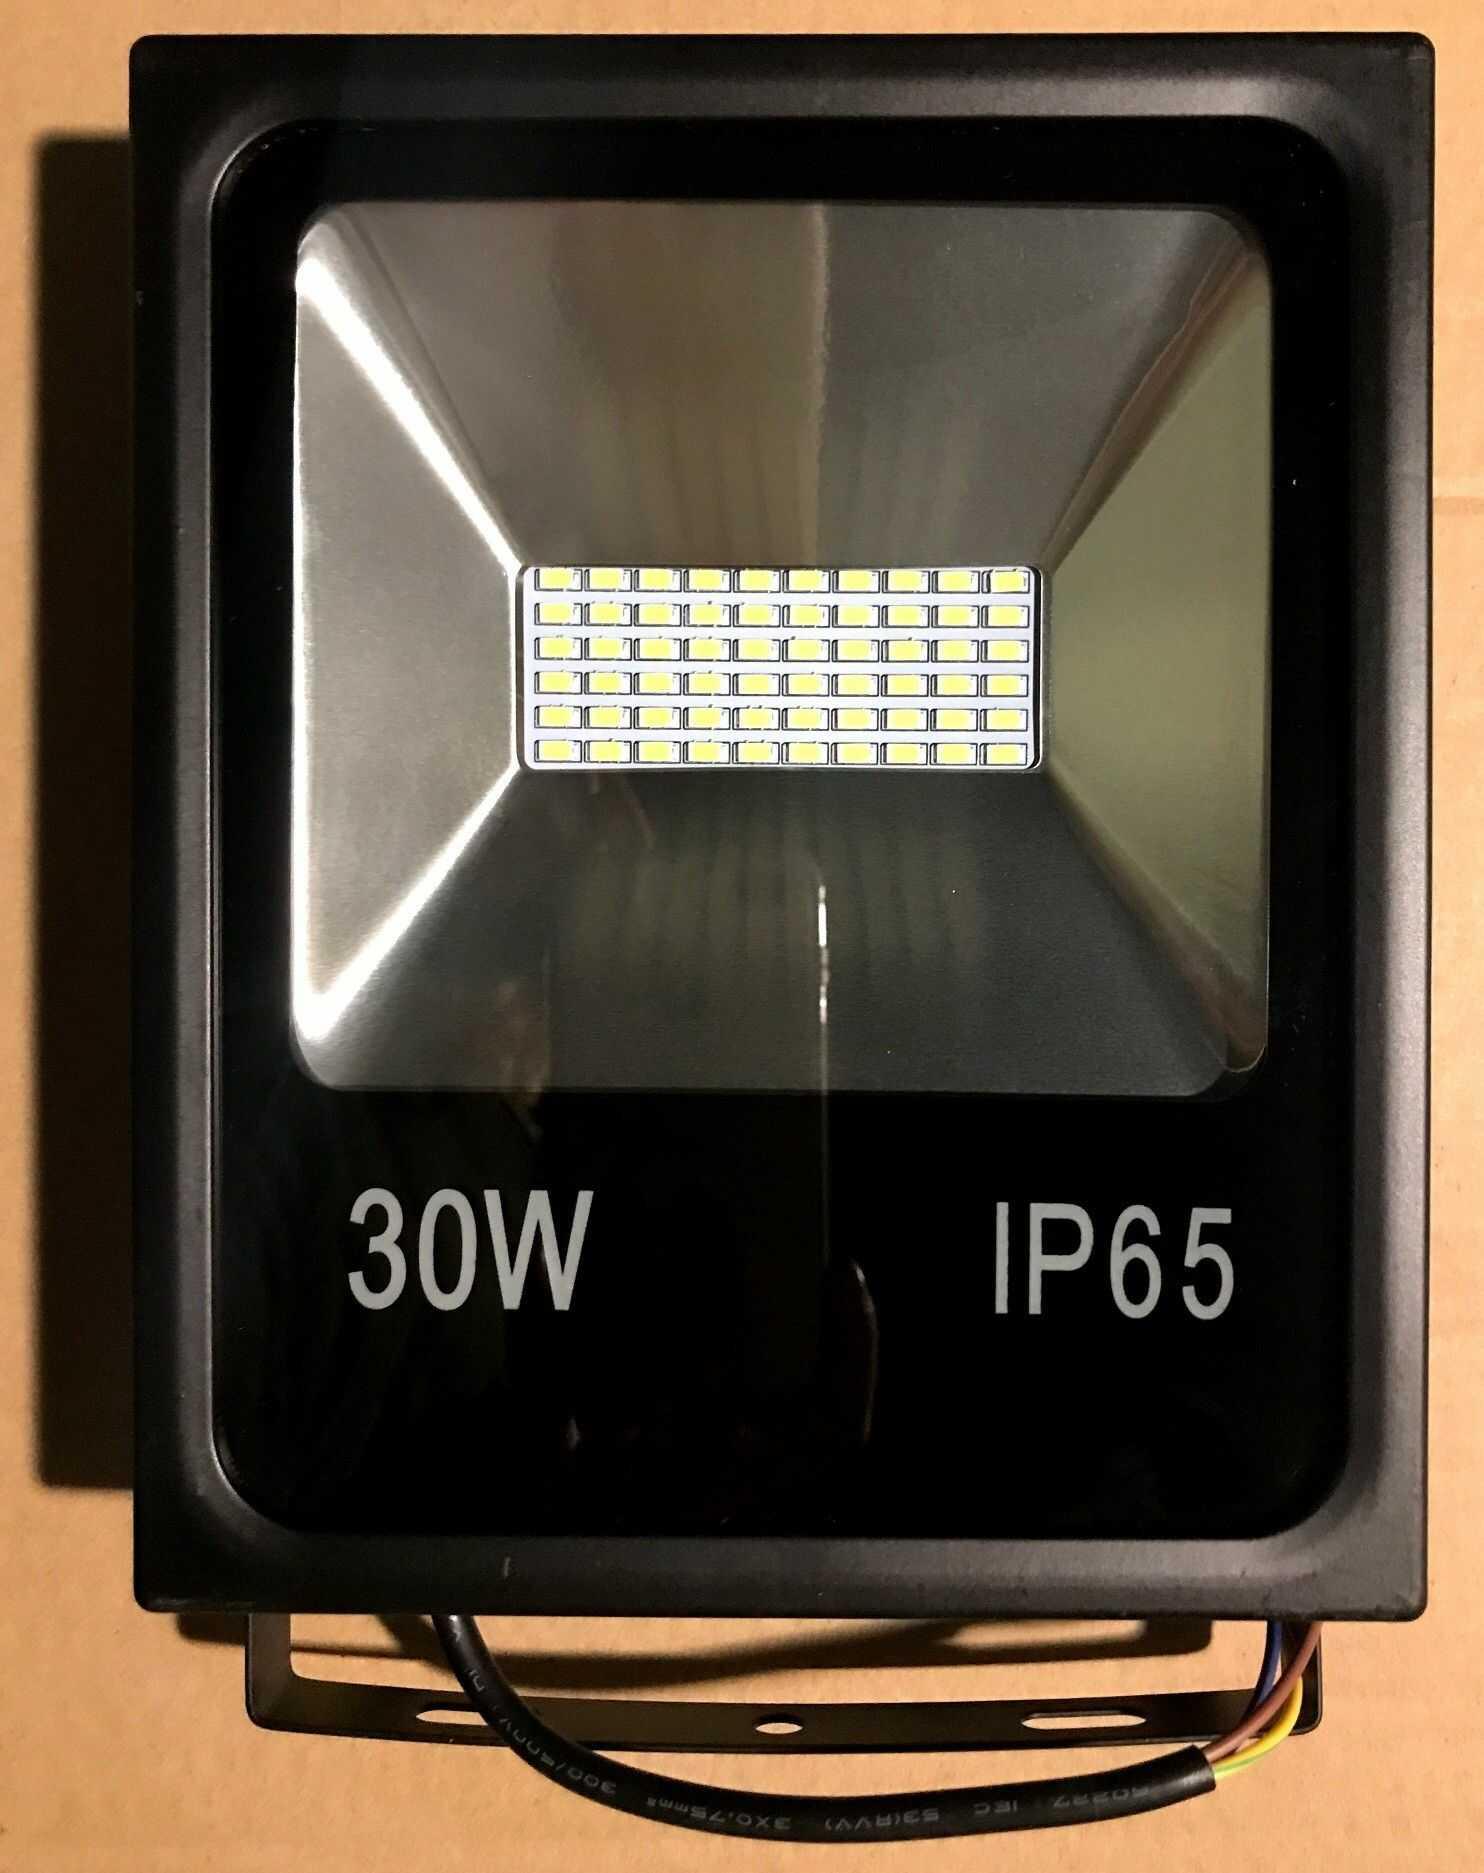 HALOGEN LAMPA NAŚWIETLACZ LED 30W 36V JAKOŚĆ!!! 13282742